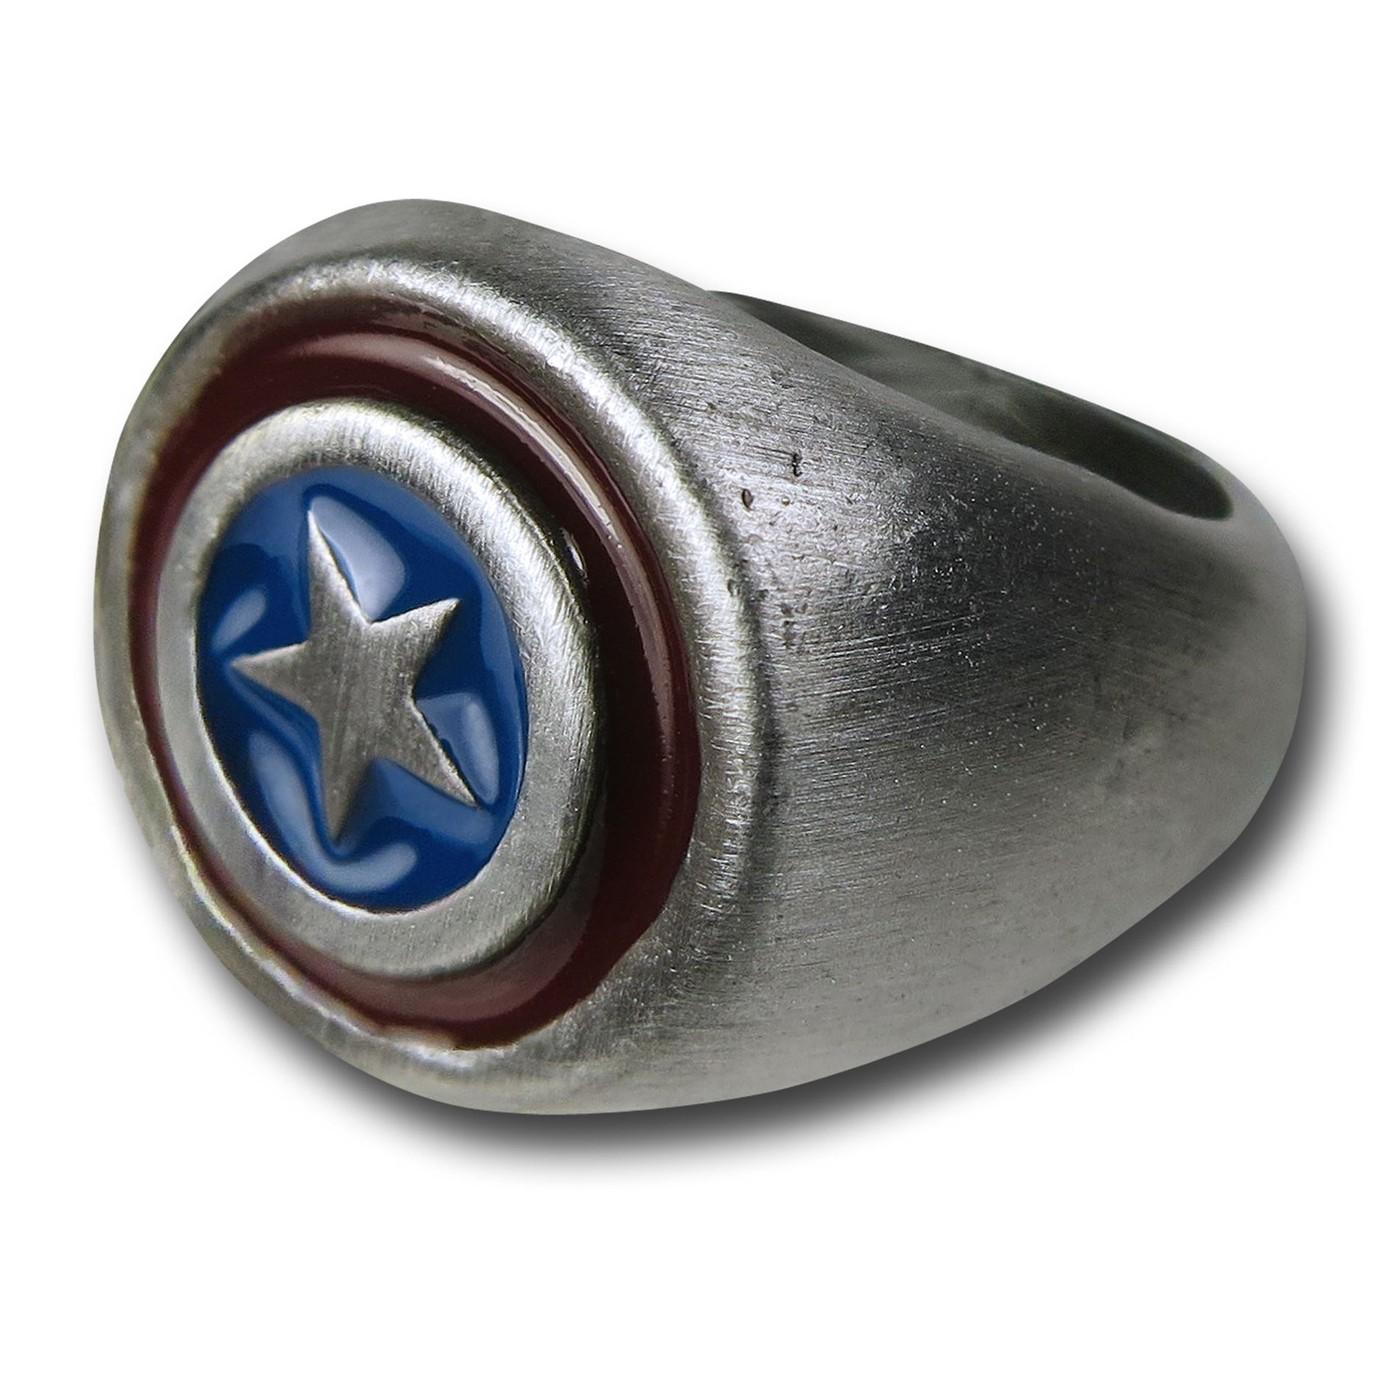 Captain America Brushed Nickel Ring